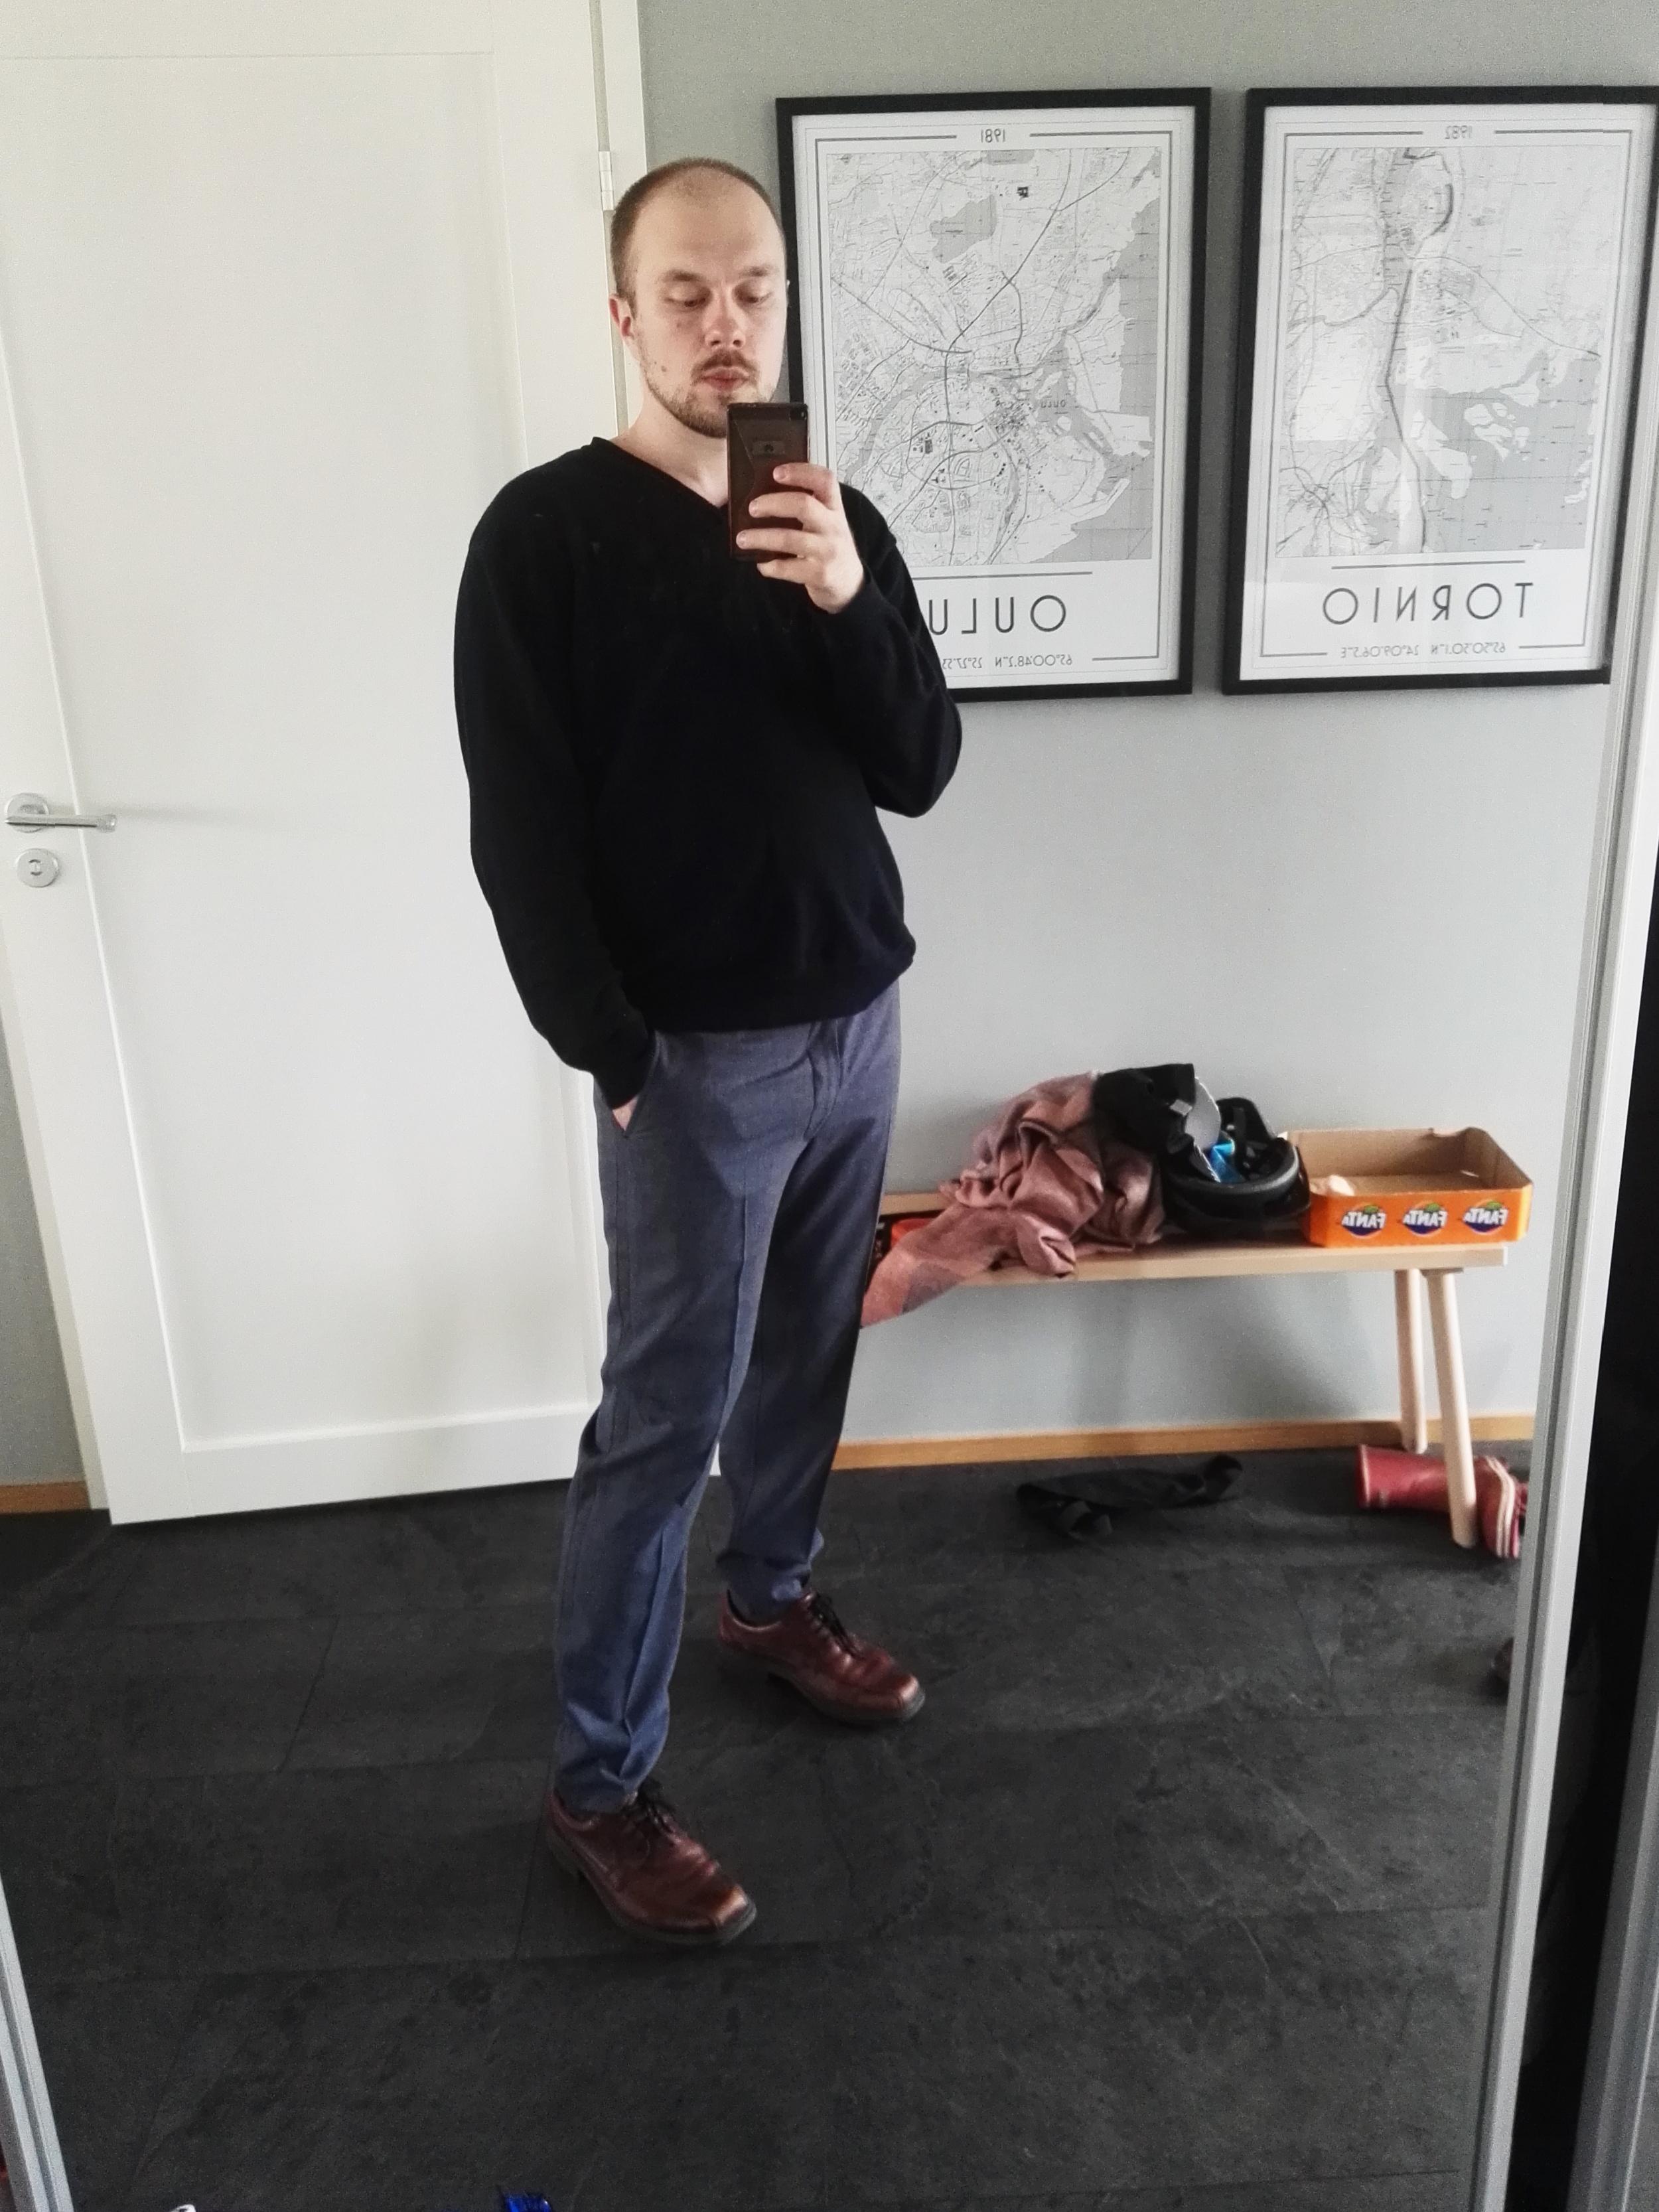 Mies (mieluisine housuineen) & peili